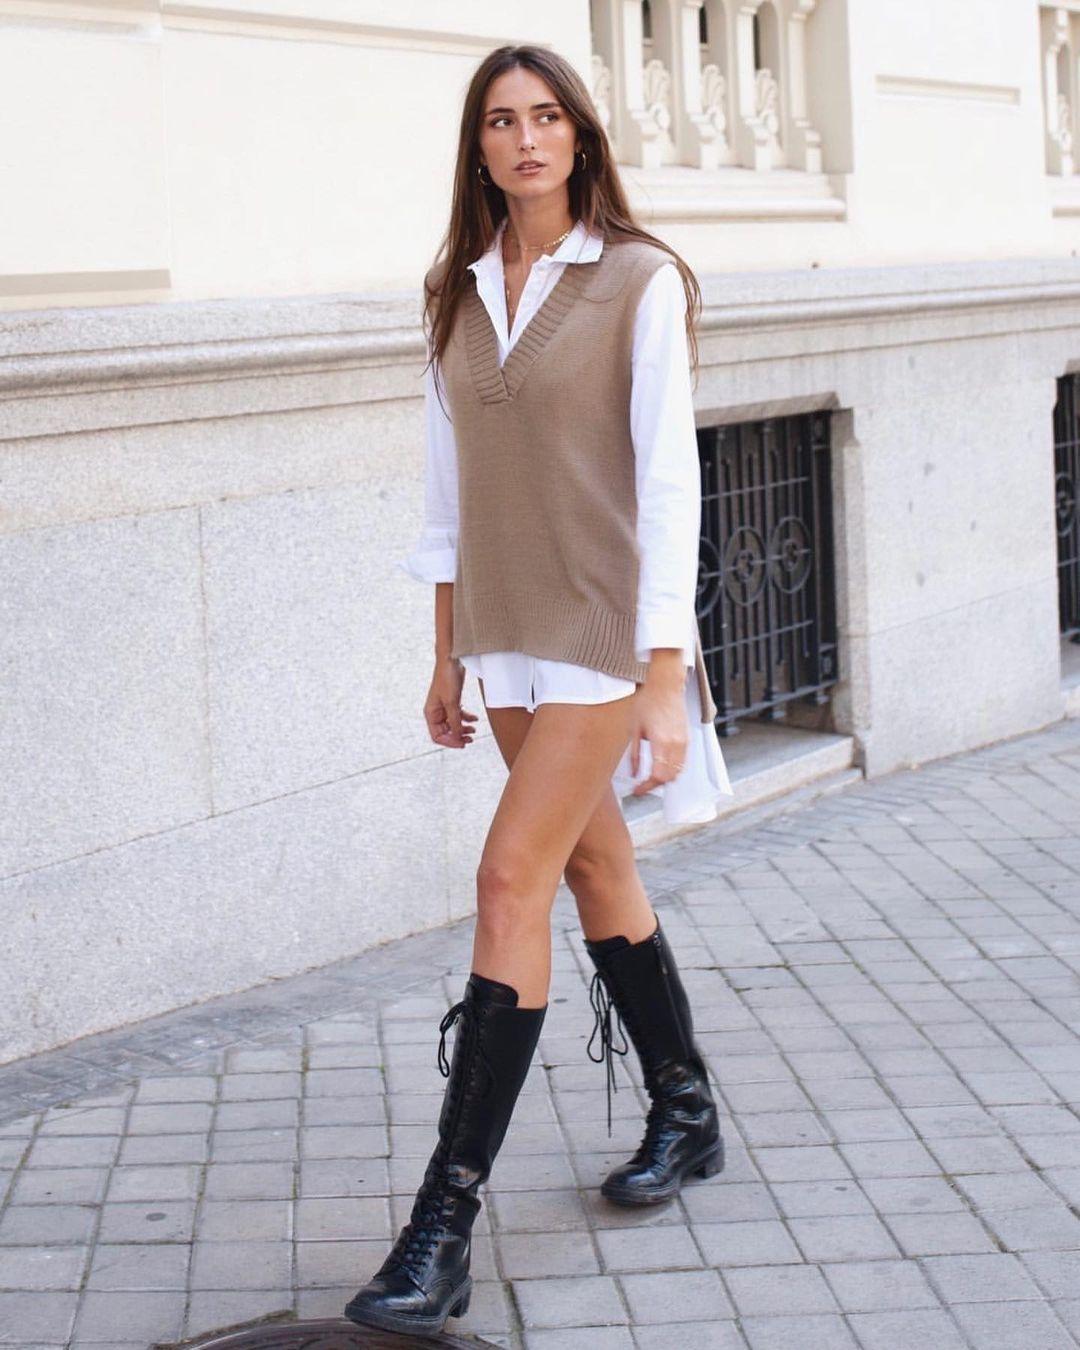 lace-up flat boots de Zara sur zaraaddiction